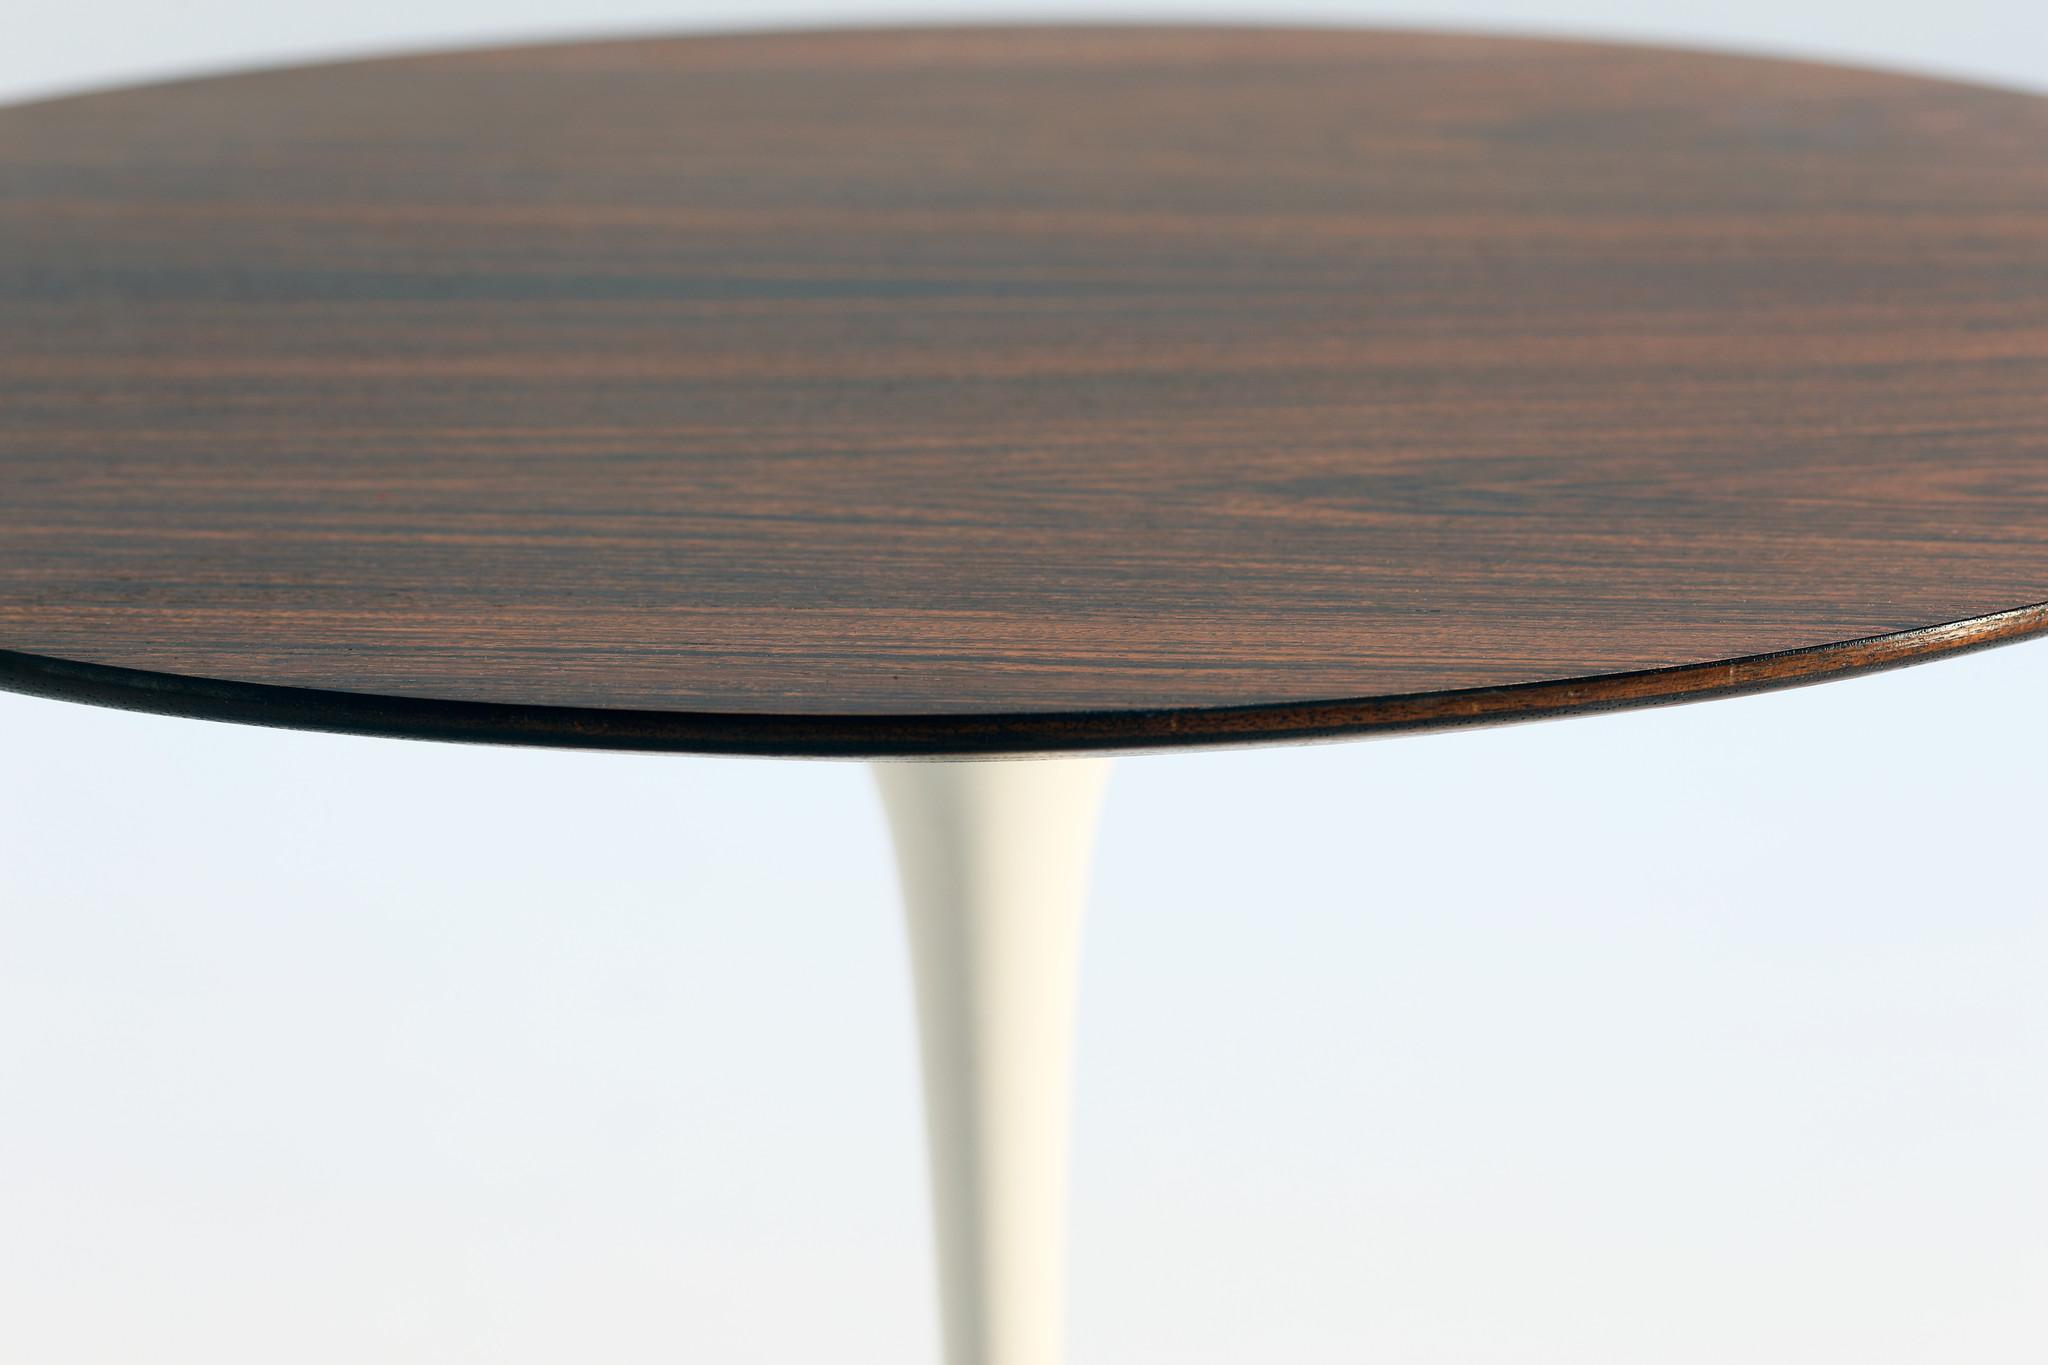 Knoll Tulip side table design Eero Saarinen